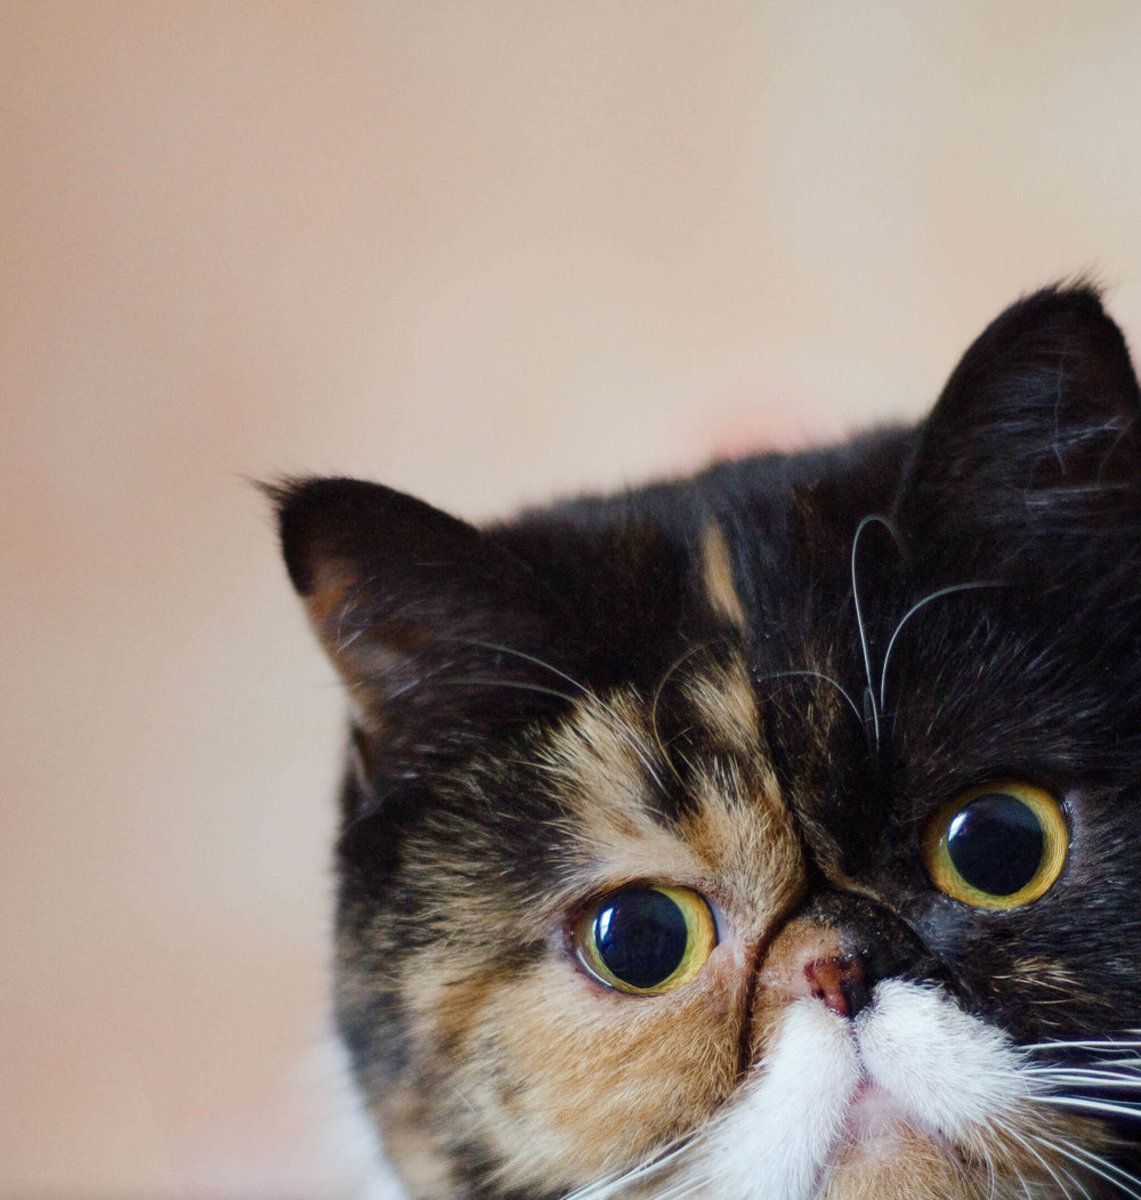 understanding-your-cats-bad-behavior-and-how-to-stop-it